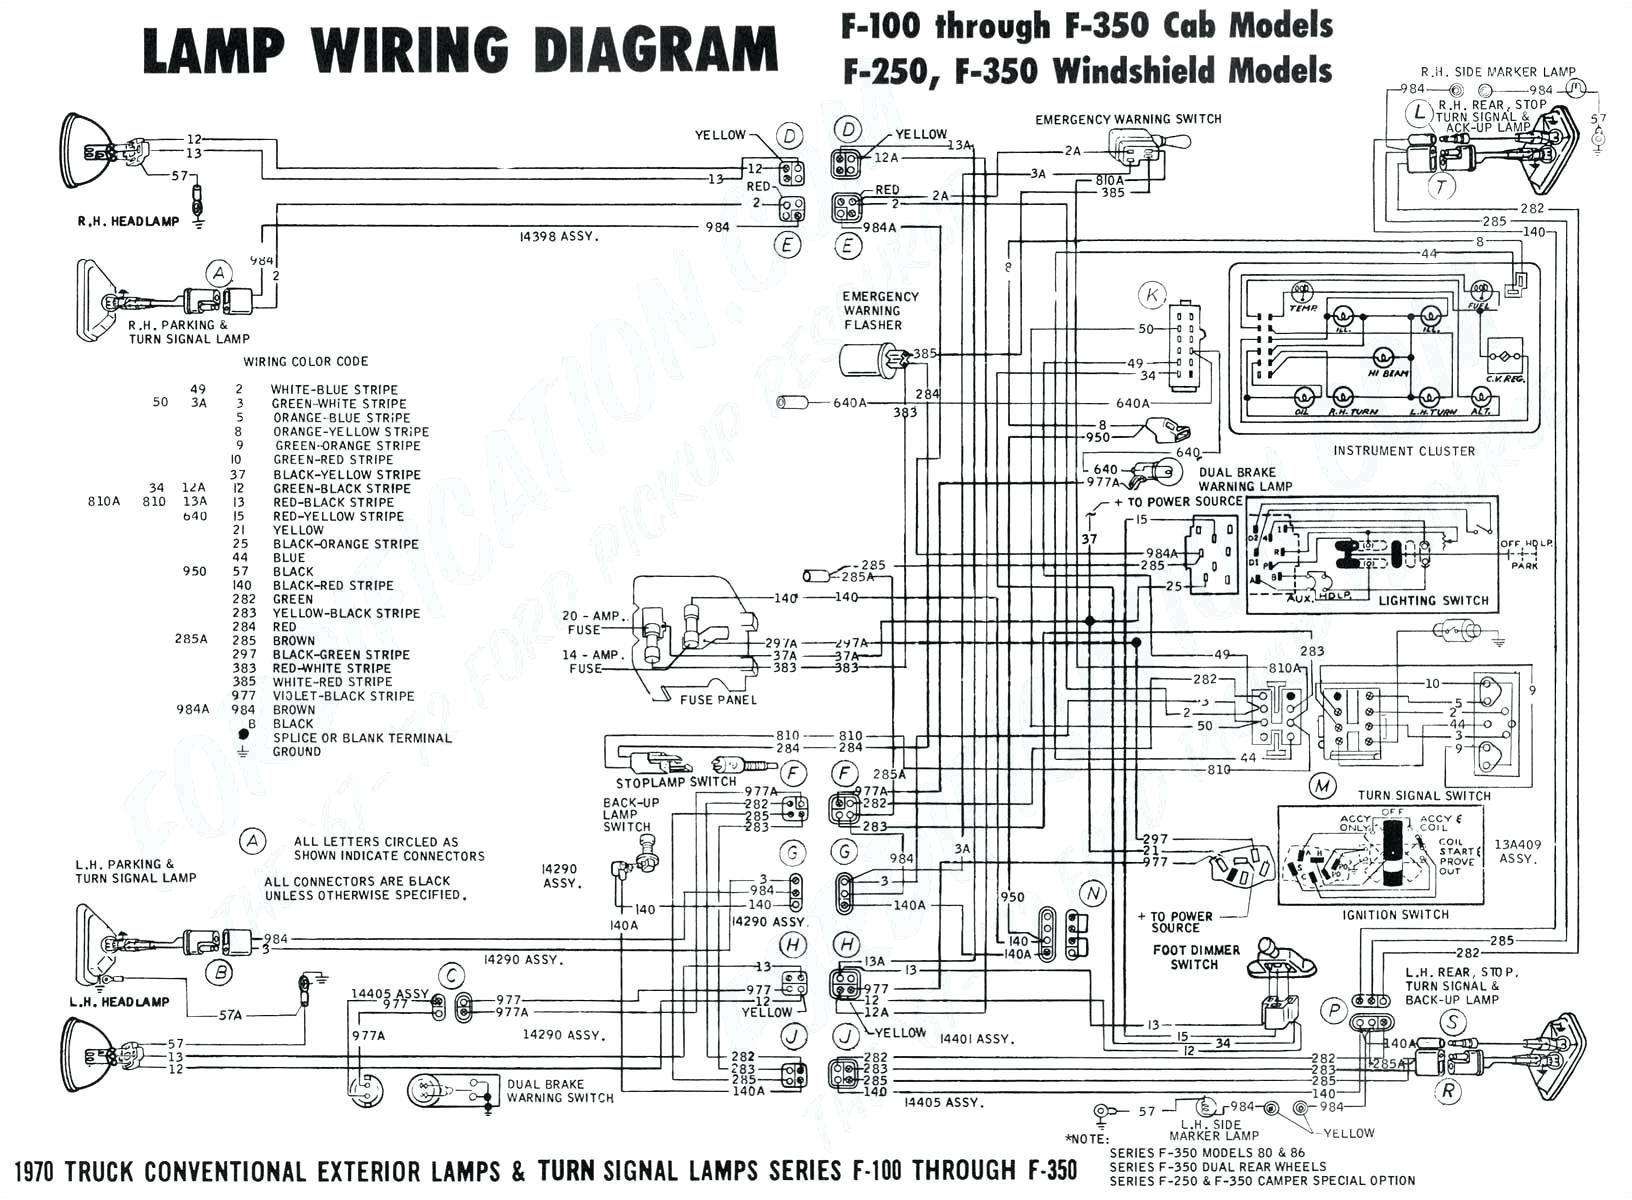 1969 Mustang Instrument Cluster Wiring Diagram 1969 Mustang Dash Wiring Diagram Wiring Diagram Centre